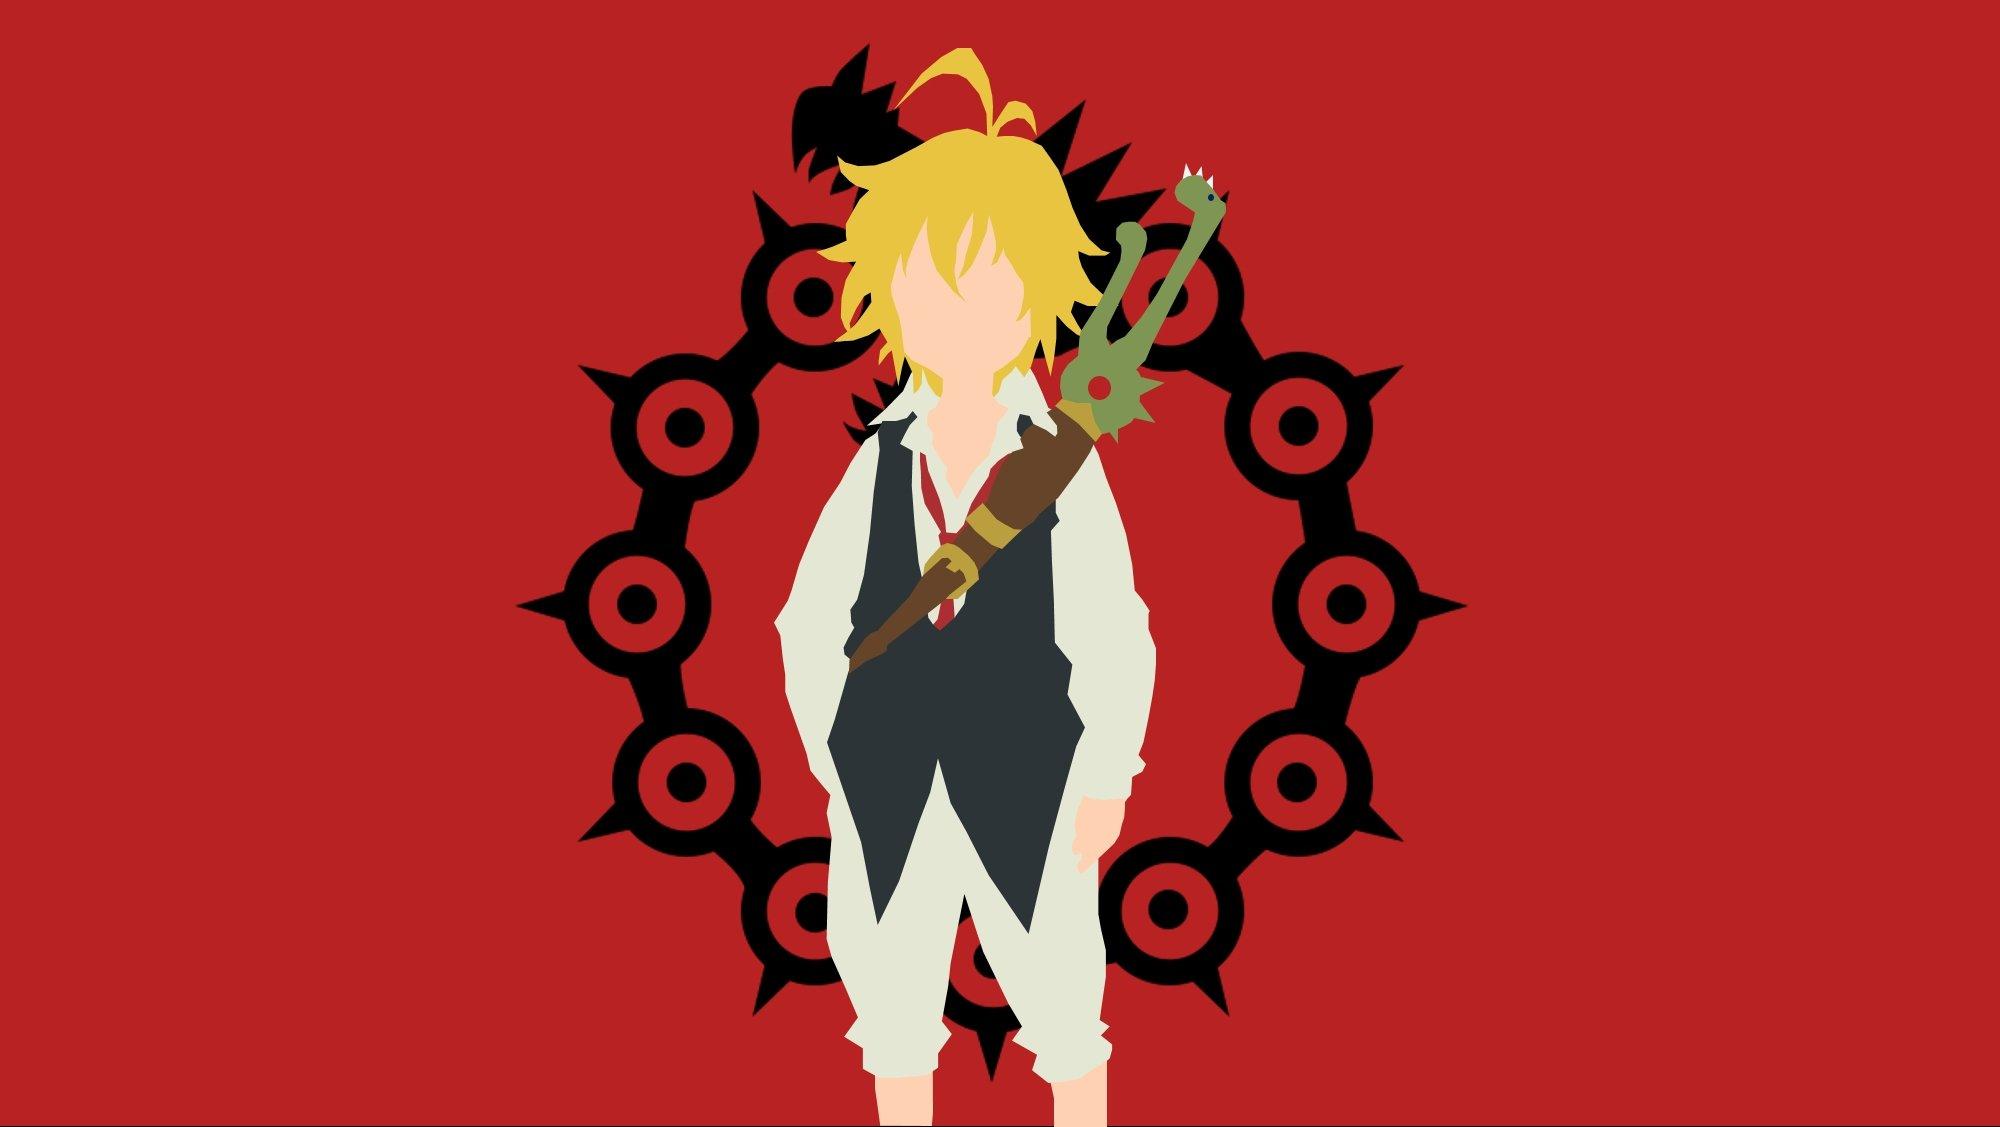 Fondos de pantalla Anime Los siete pecados capitales Artwork